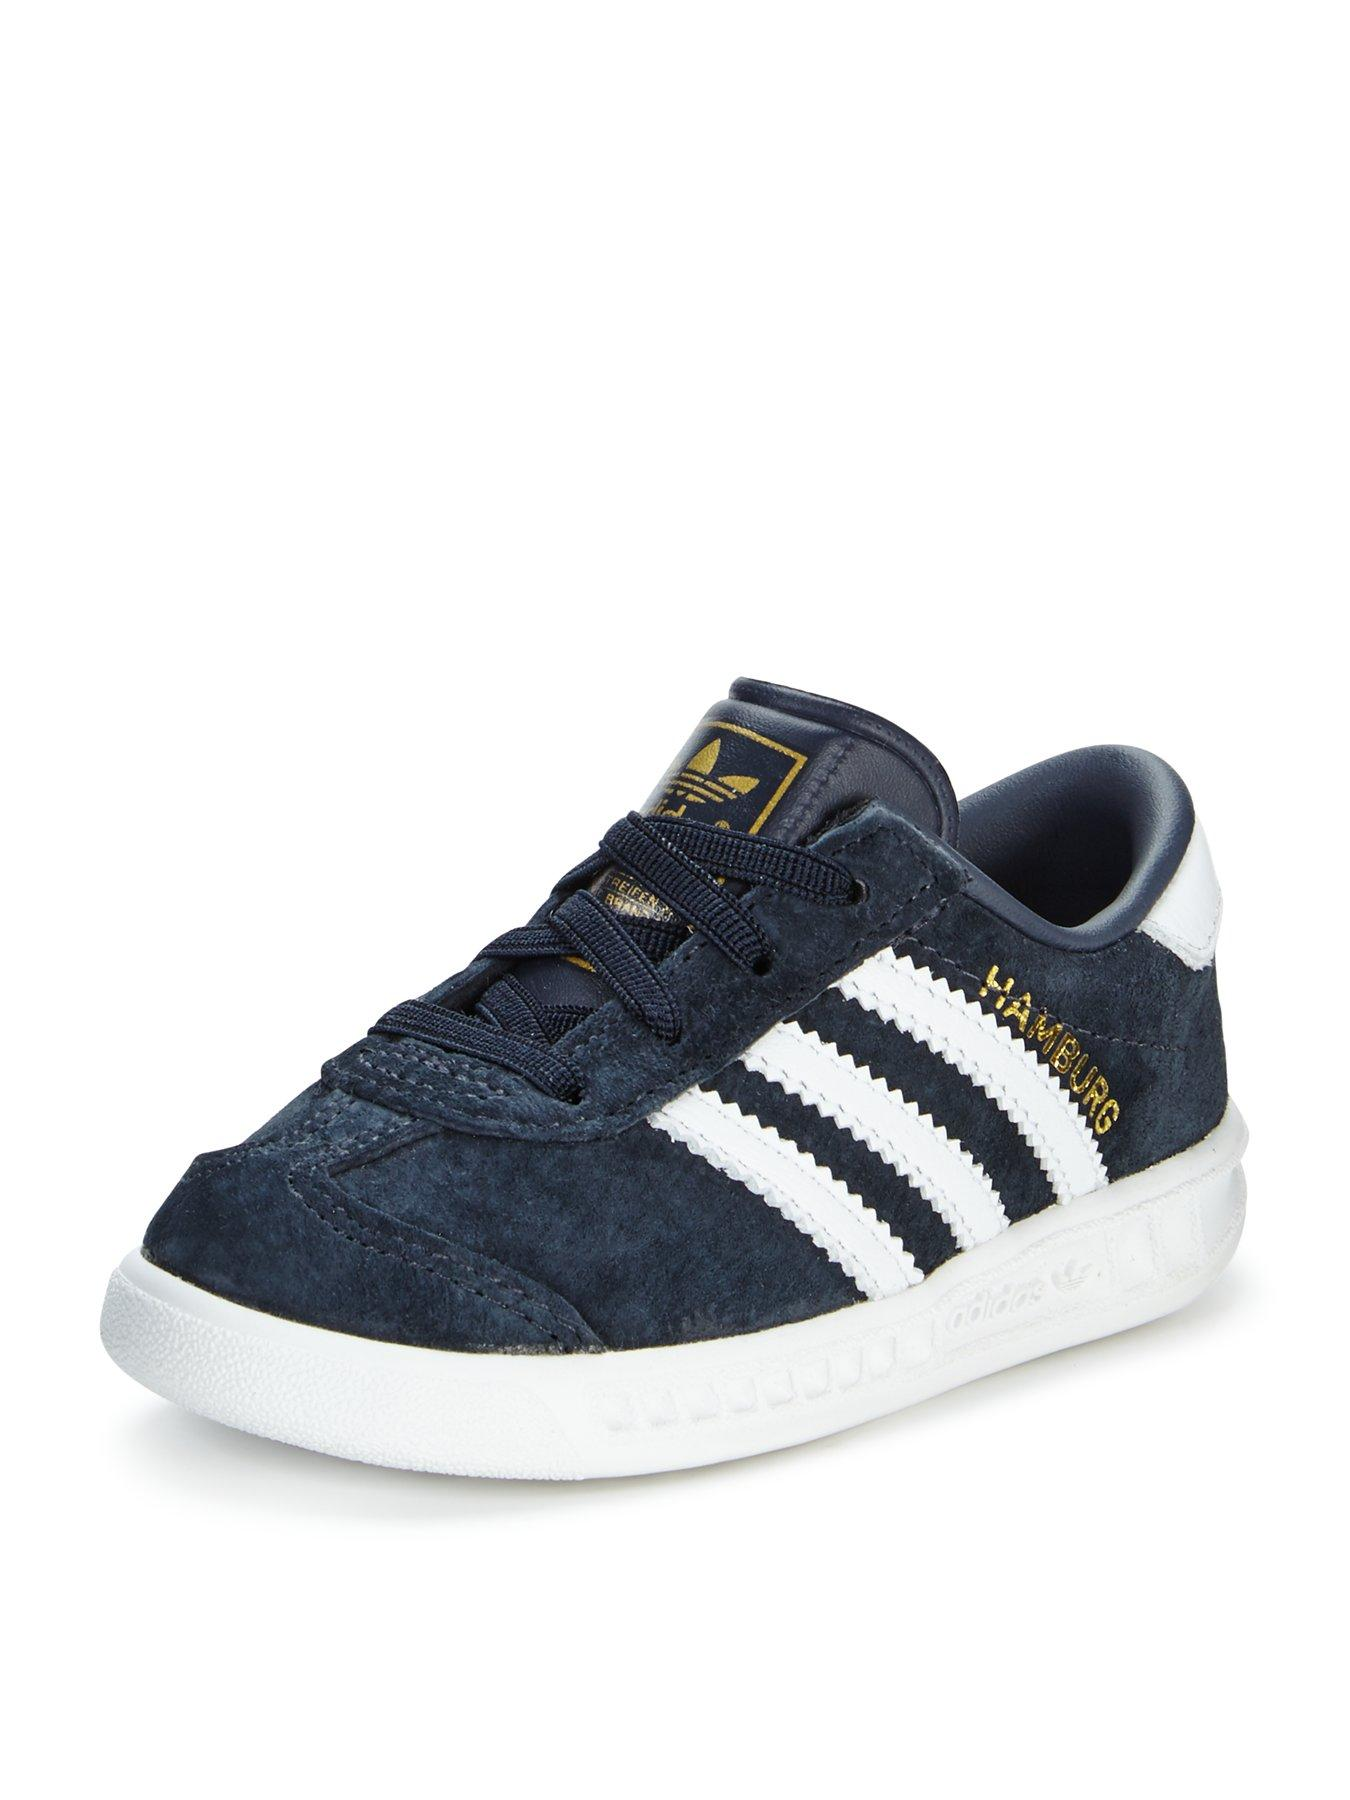 baby adidas trainers uk